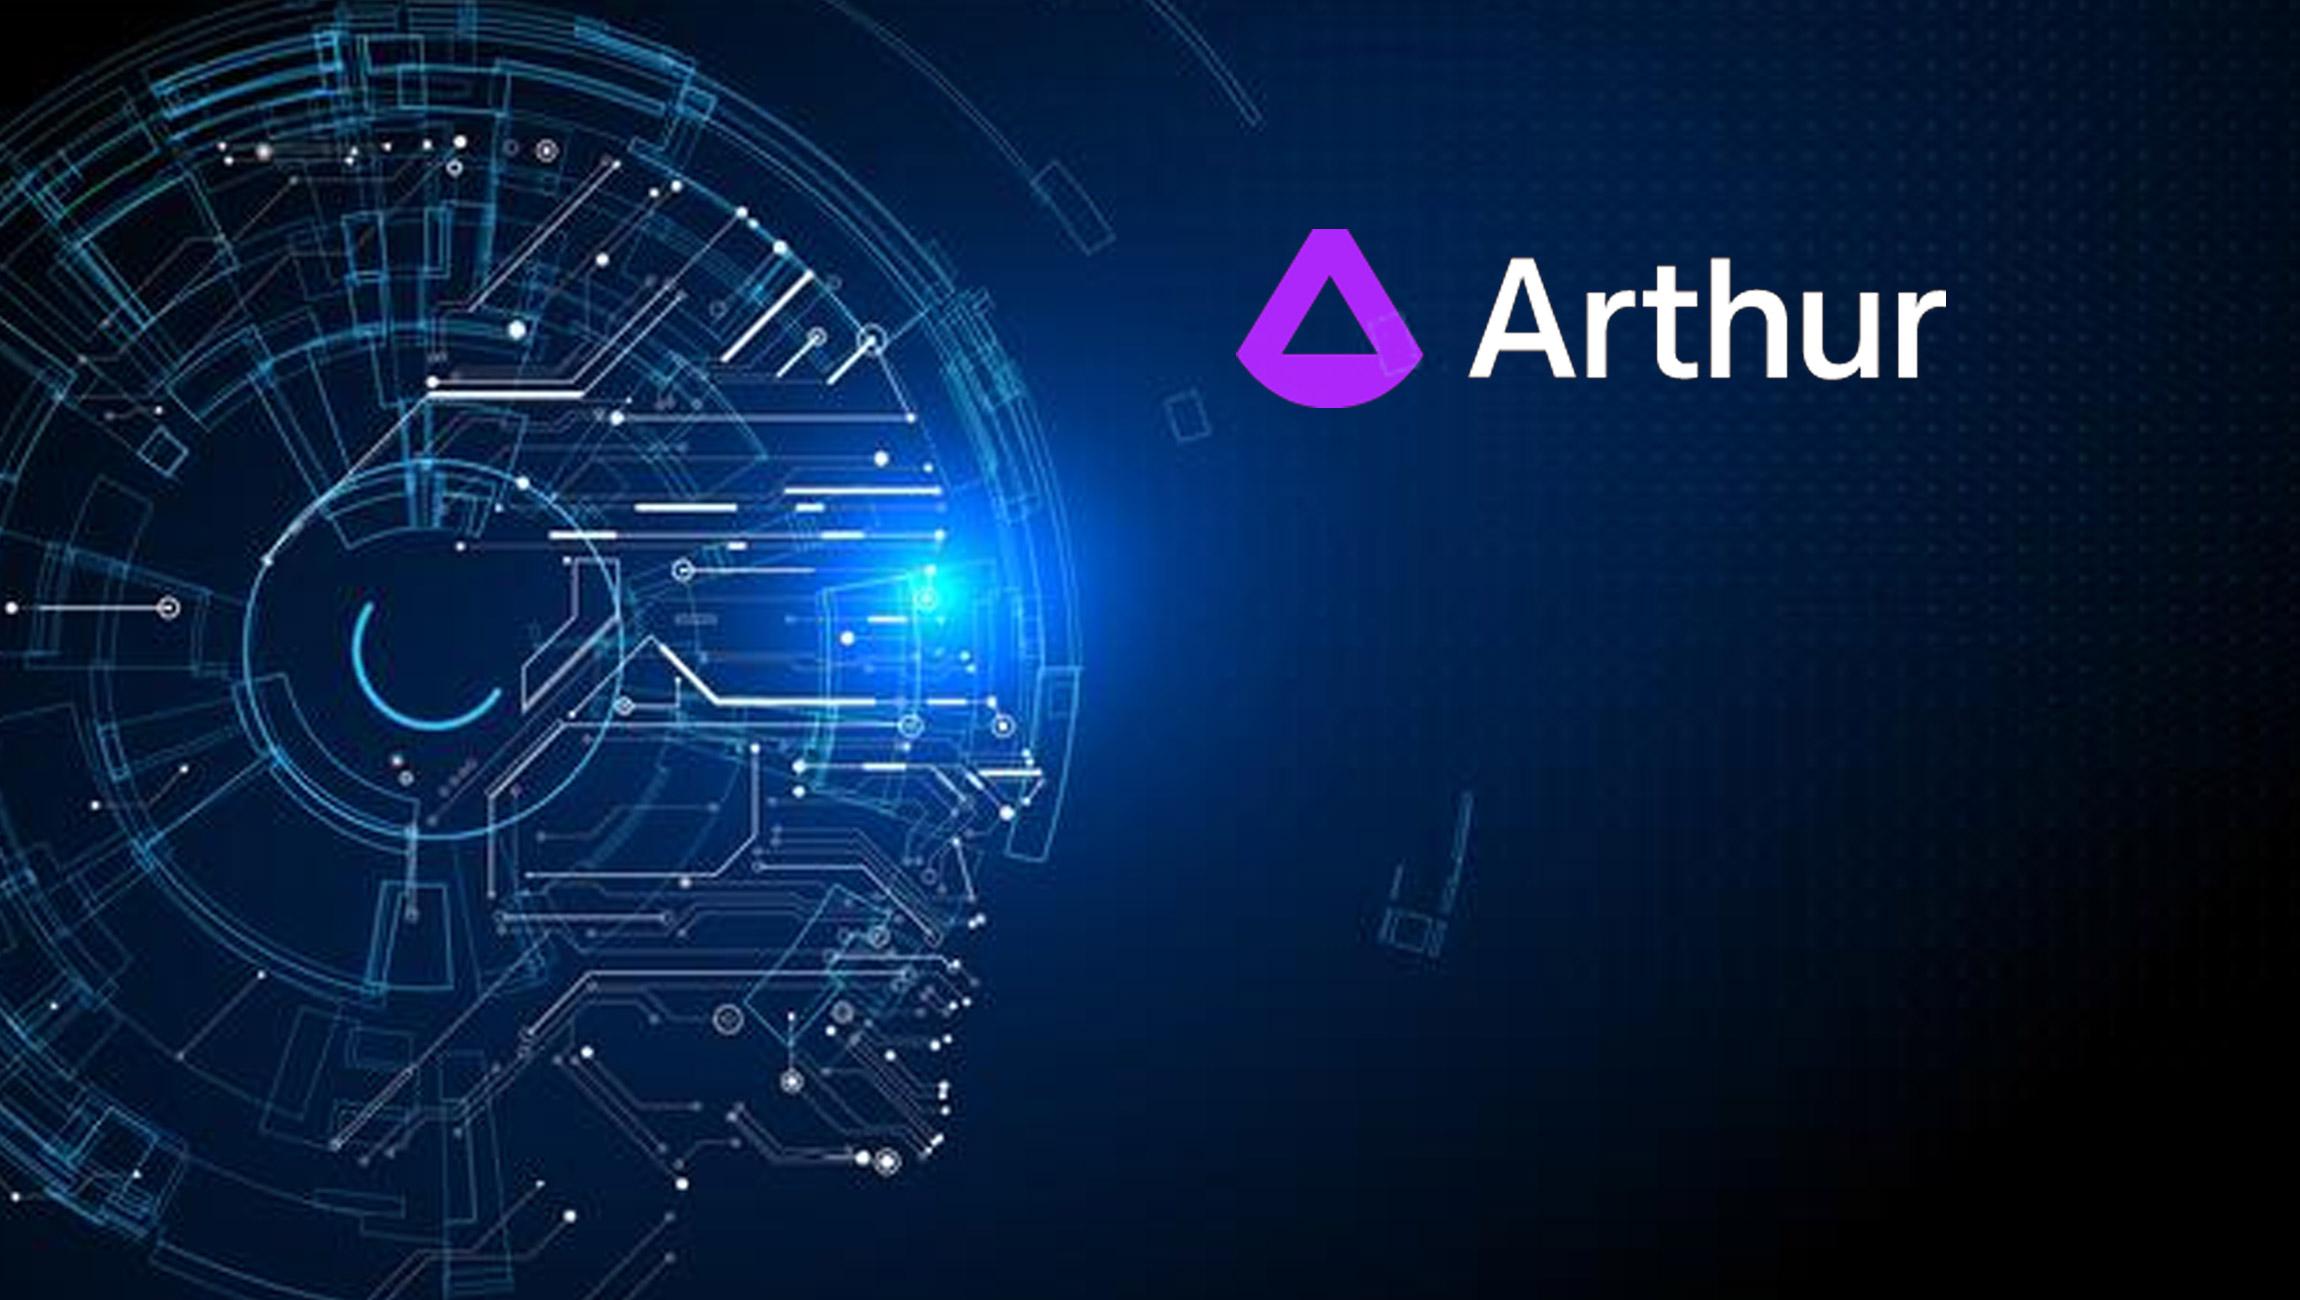 Arthur-named-a-2021-Gartner-Cool-Vendor-in-AI-Governance-and-Responsible-AI